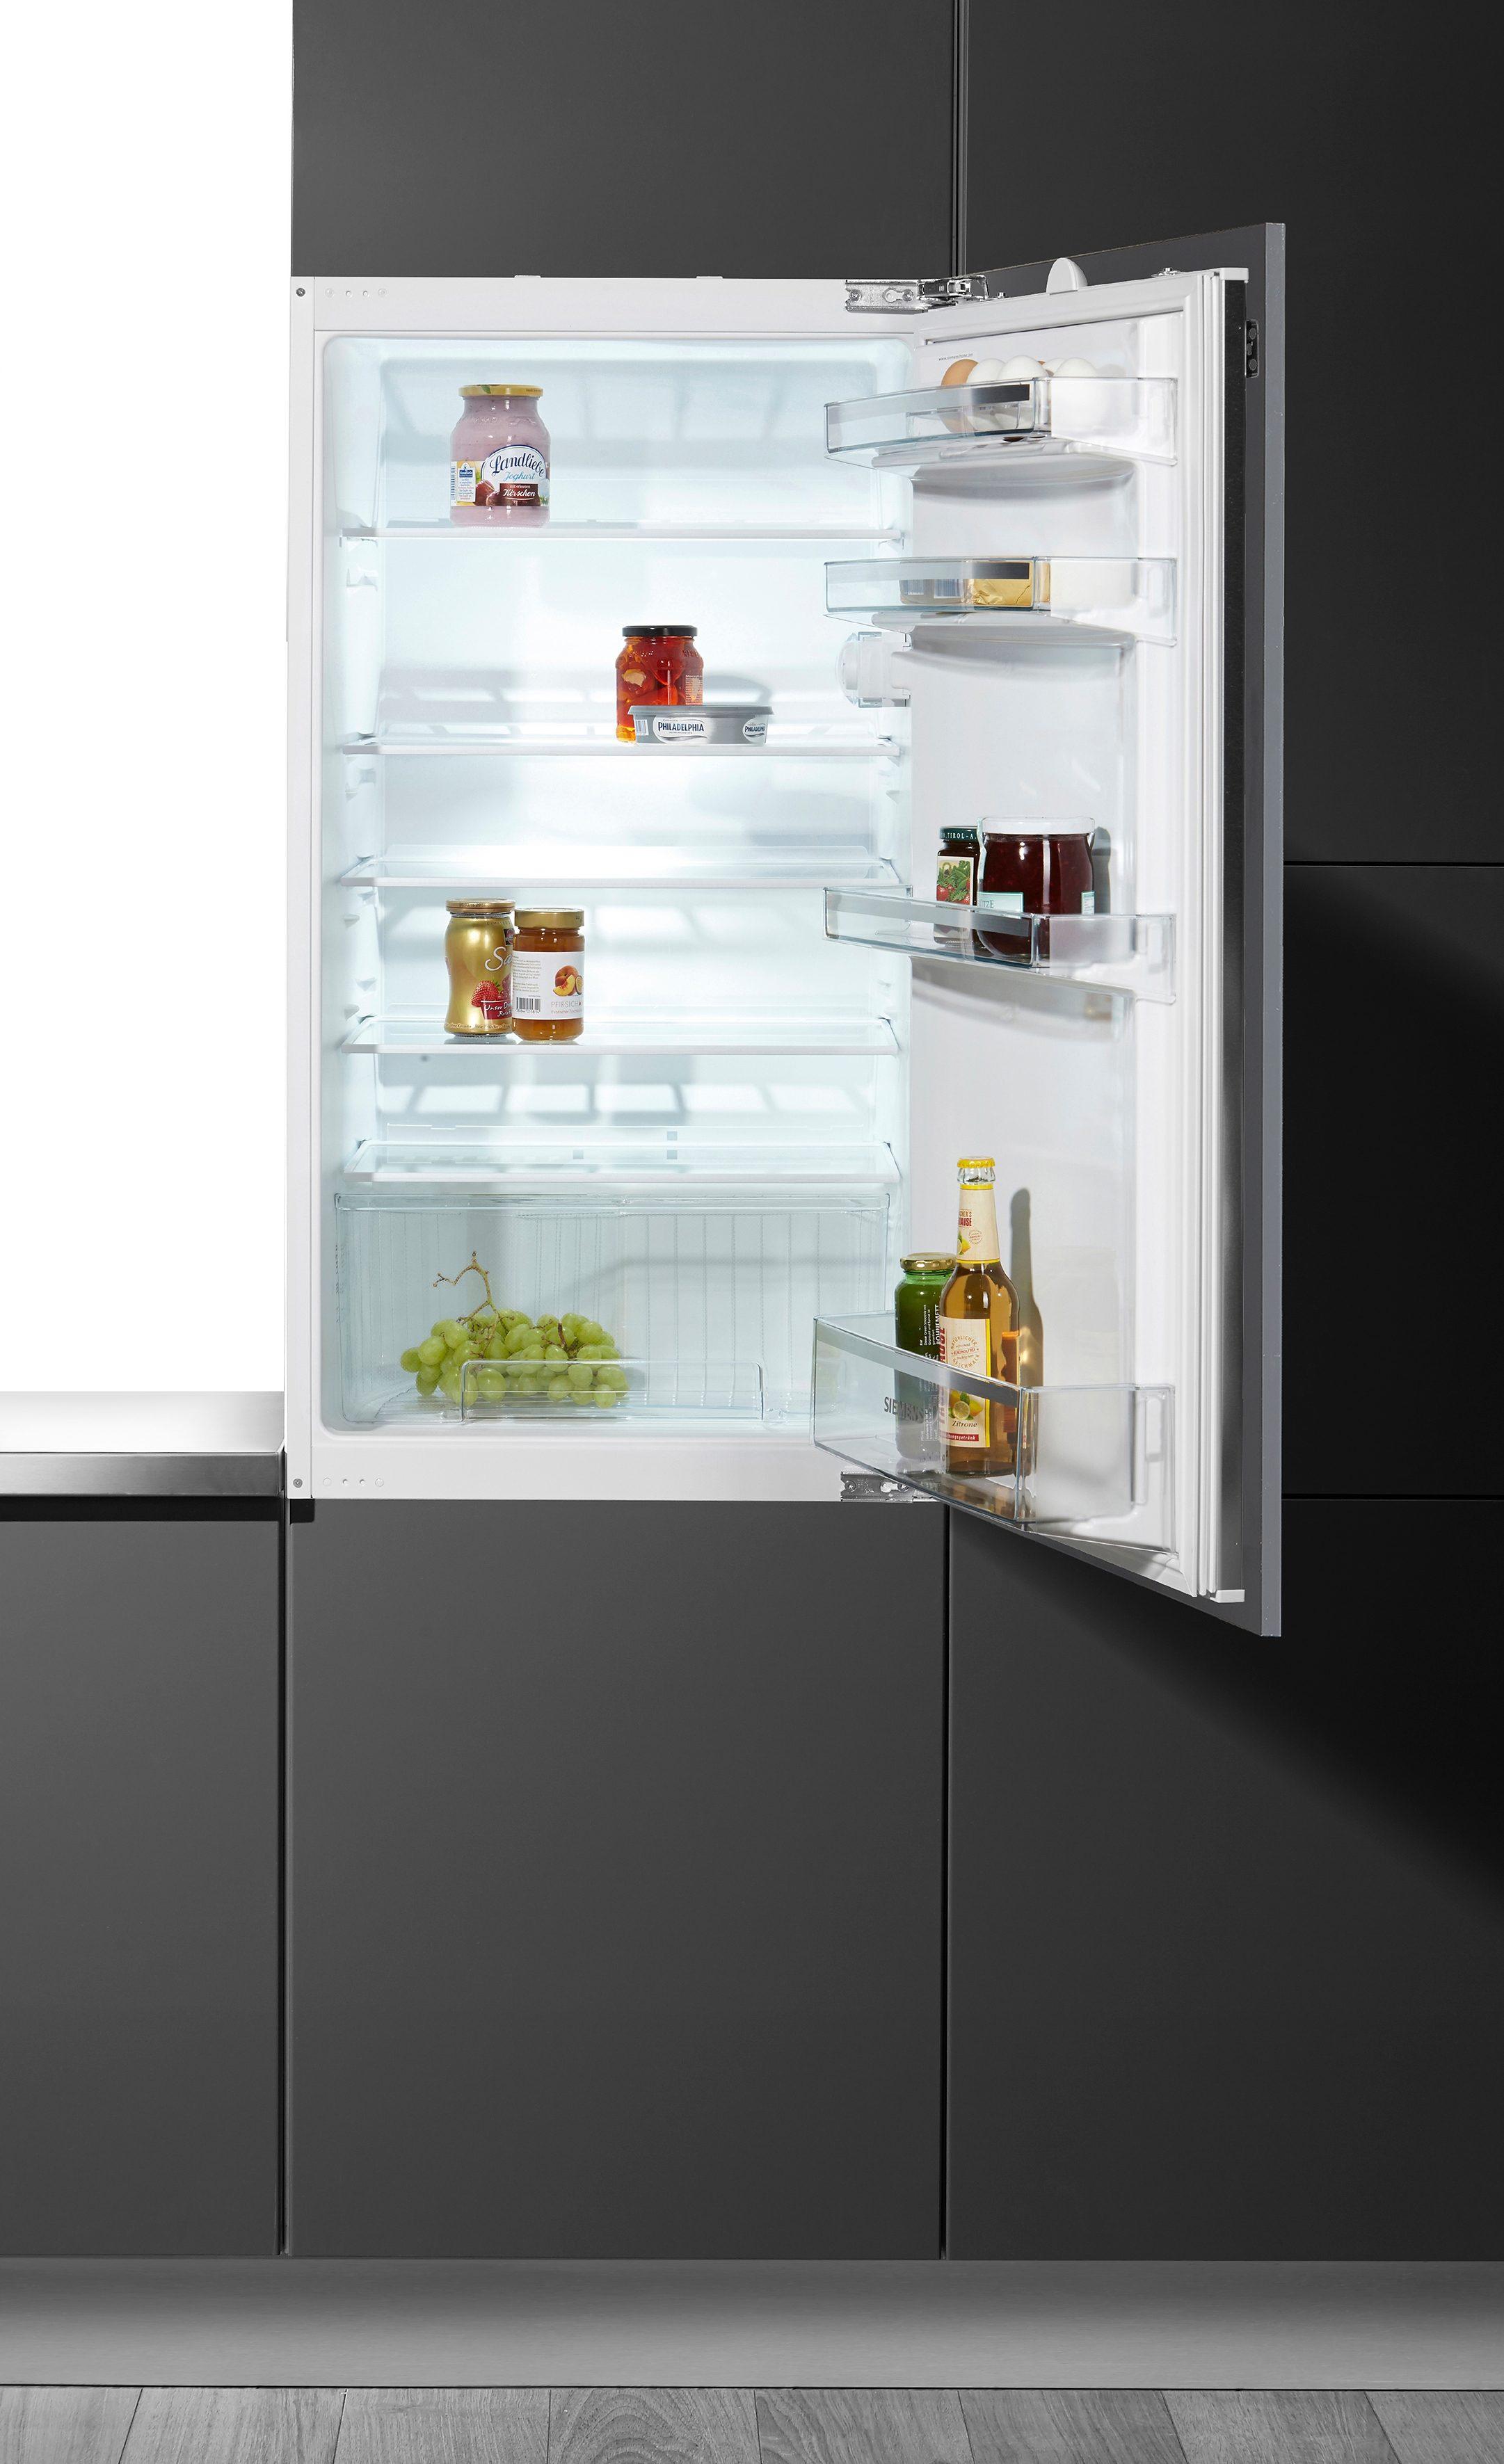 Siemens integrierbarer Einbau-Kühlschrank KI20RV60, A++, 102,5 cm